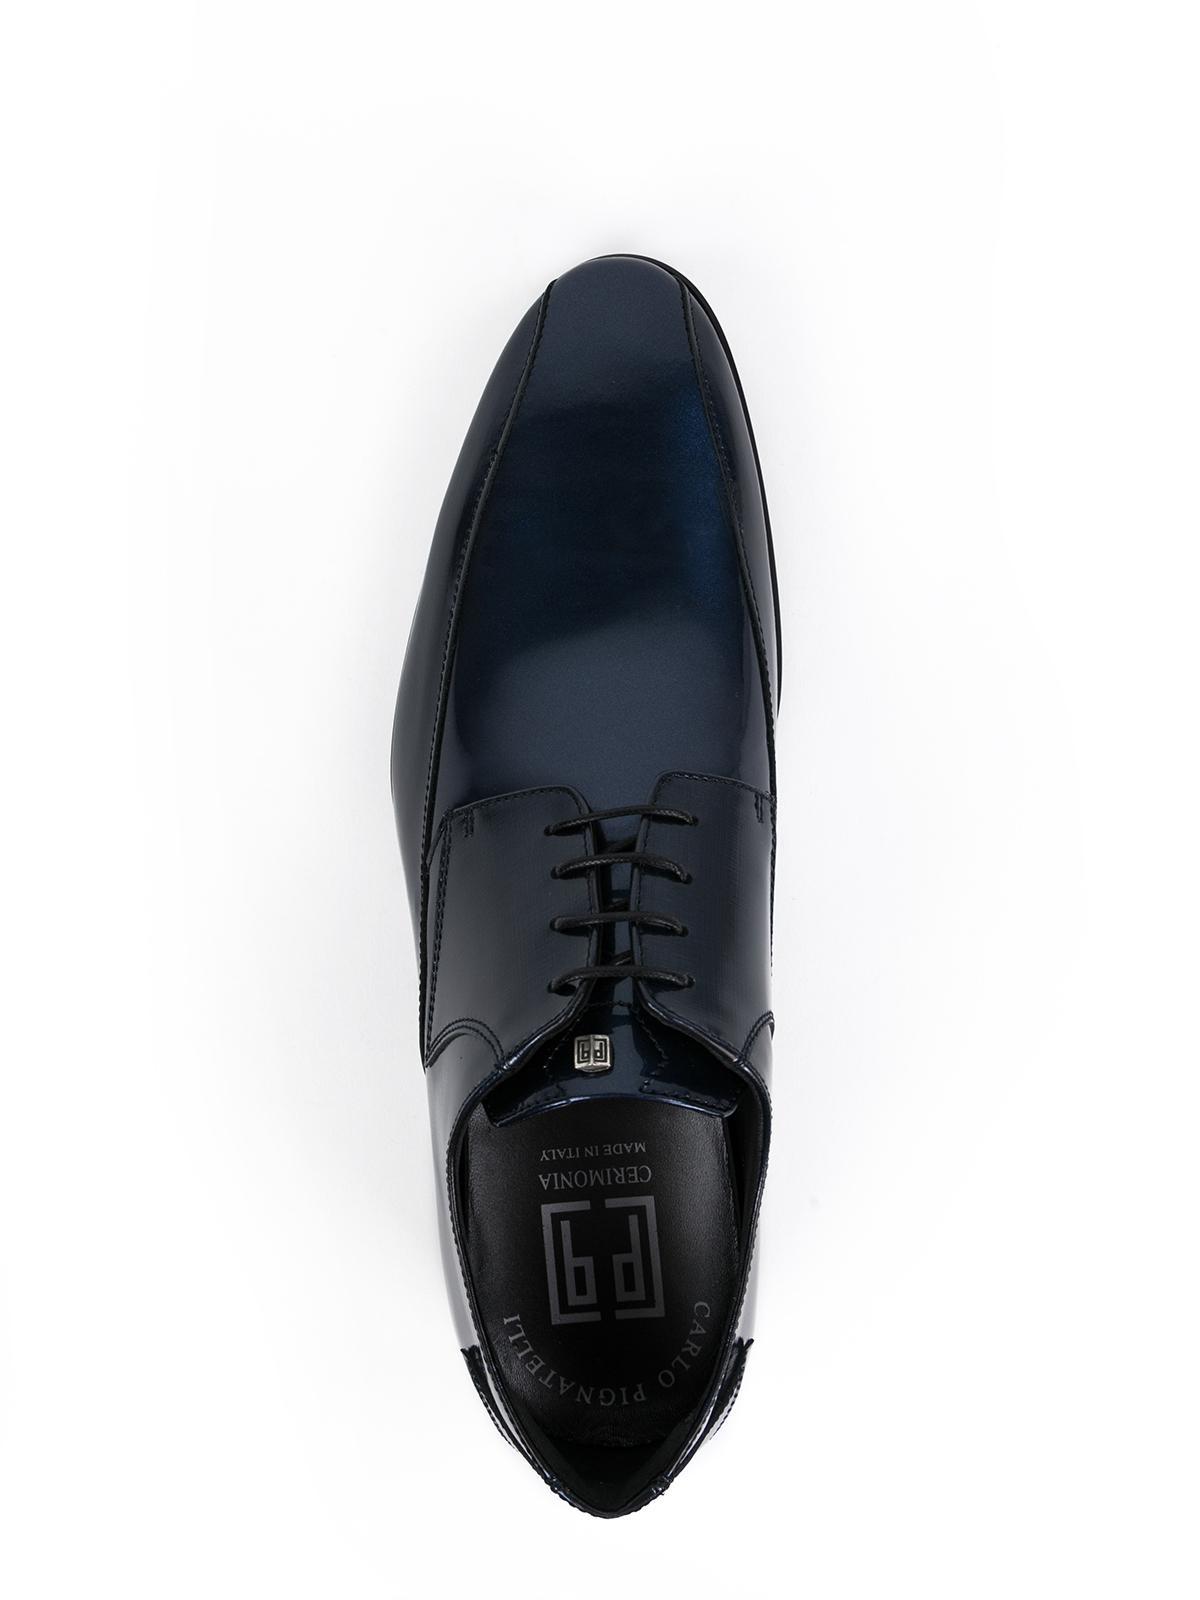 62abfc8840 cerimonia uomo pignatelli - calzature   SPADA SRL